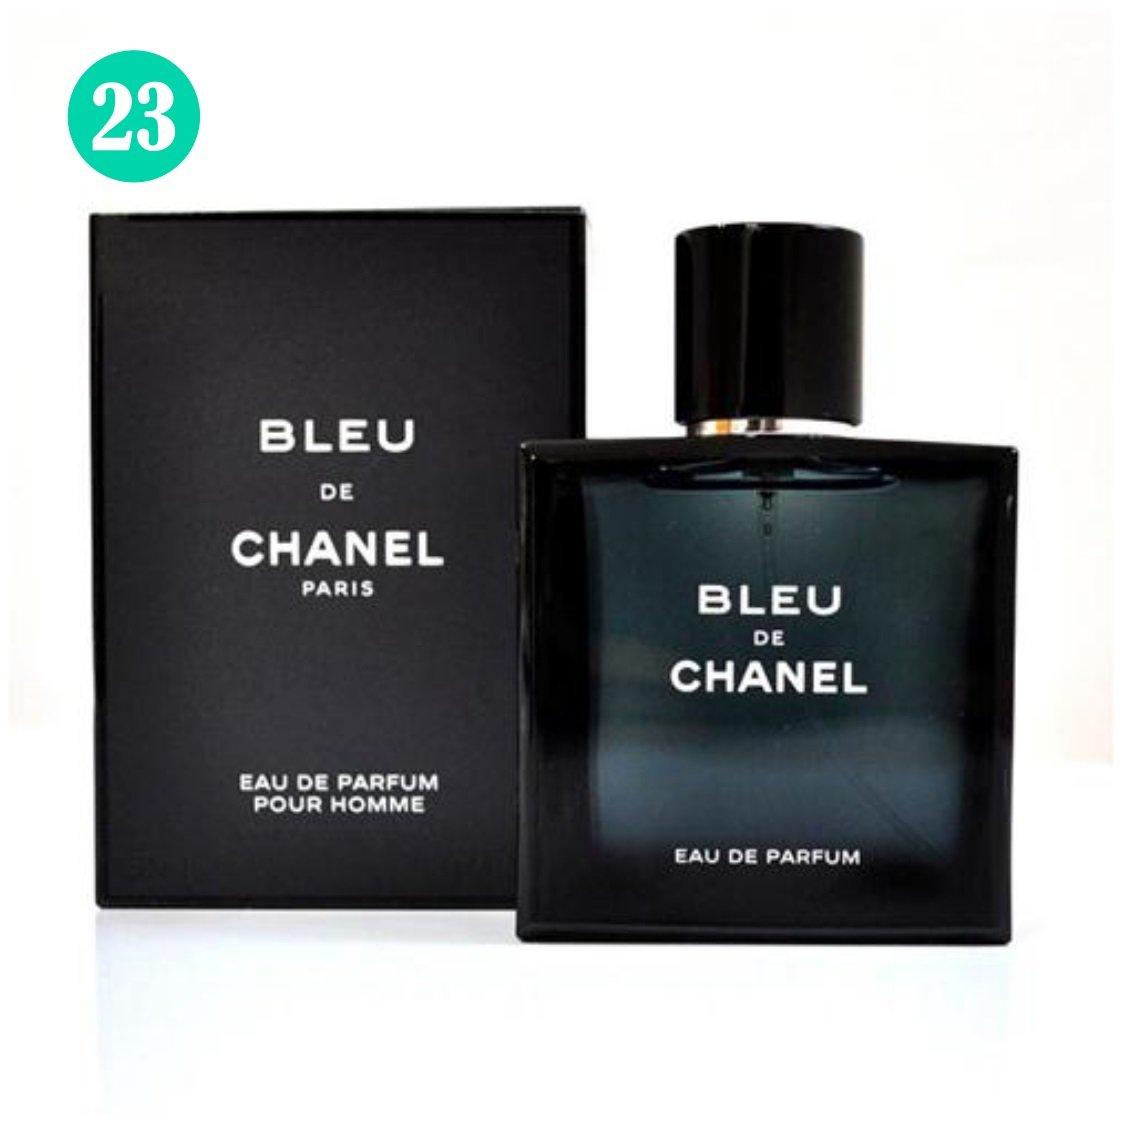 BLUE DE CHANEL - Chanel uomo